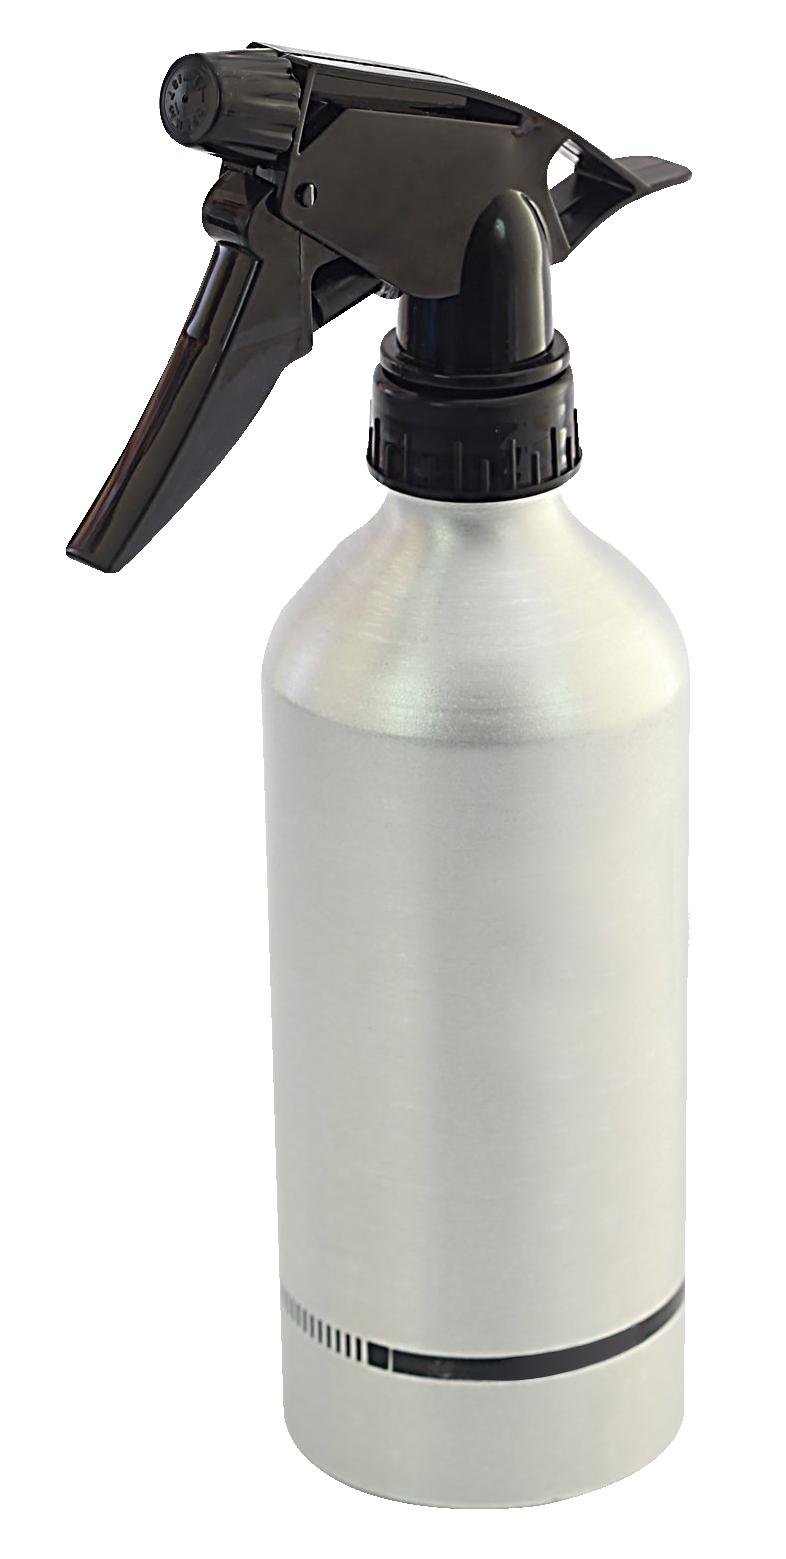 Spray Bottle Png Image Bottle Spray Bottle Spray